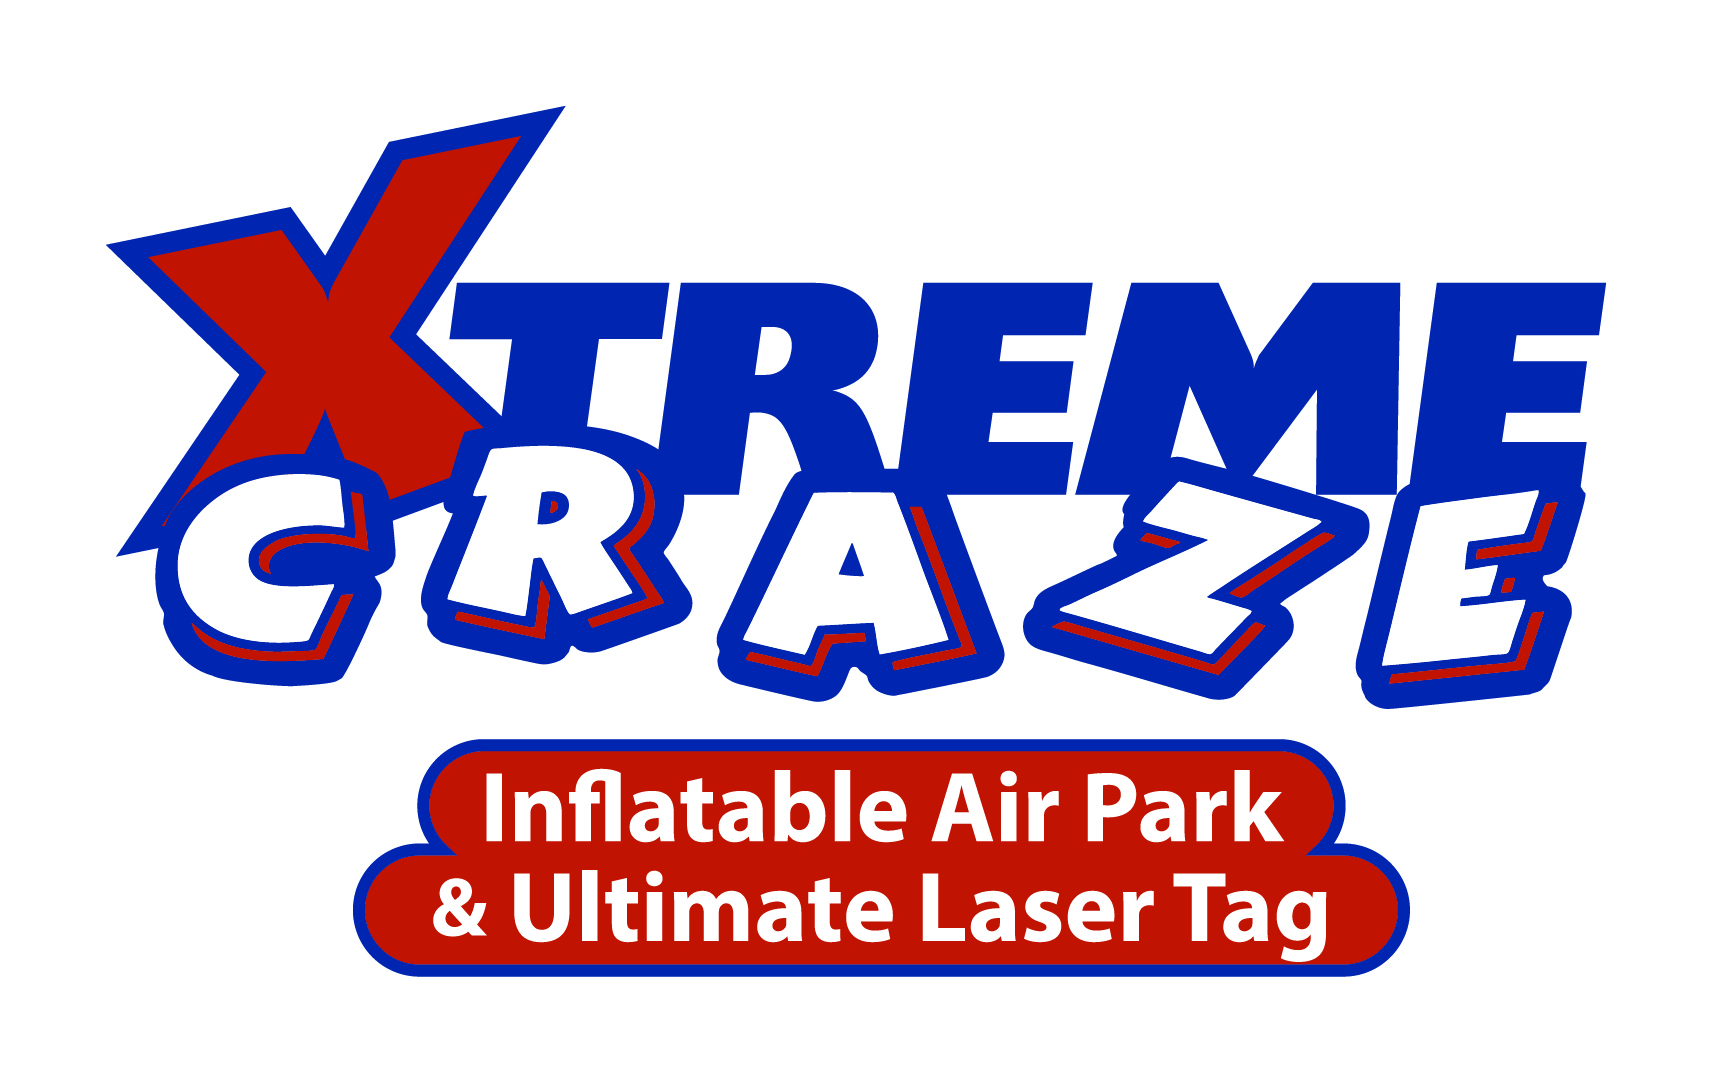 logo for Xtreme Craze